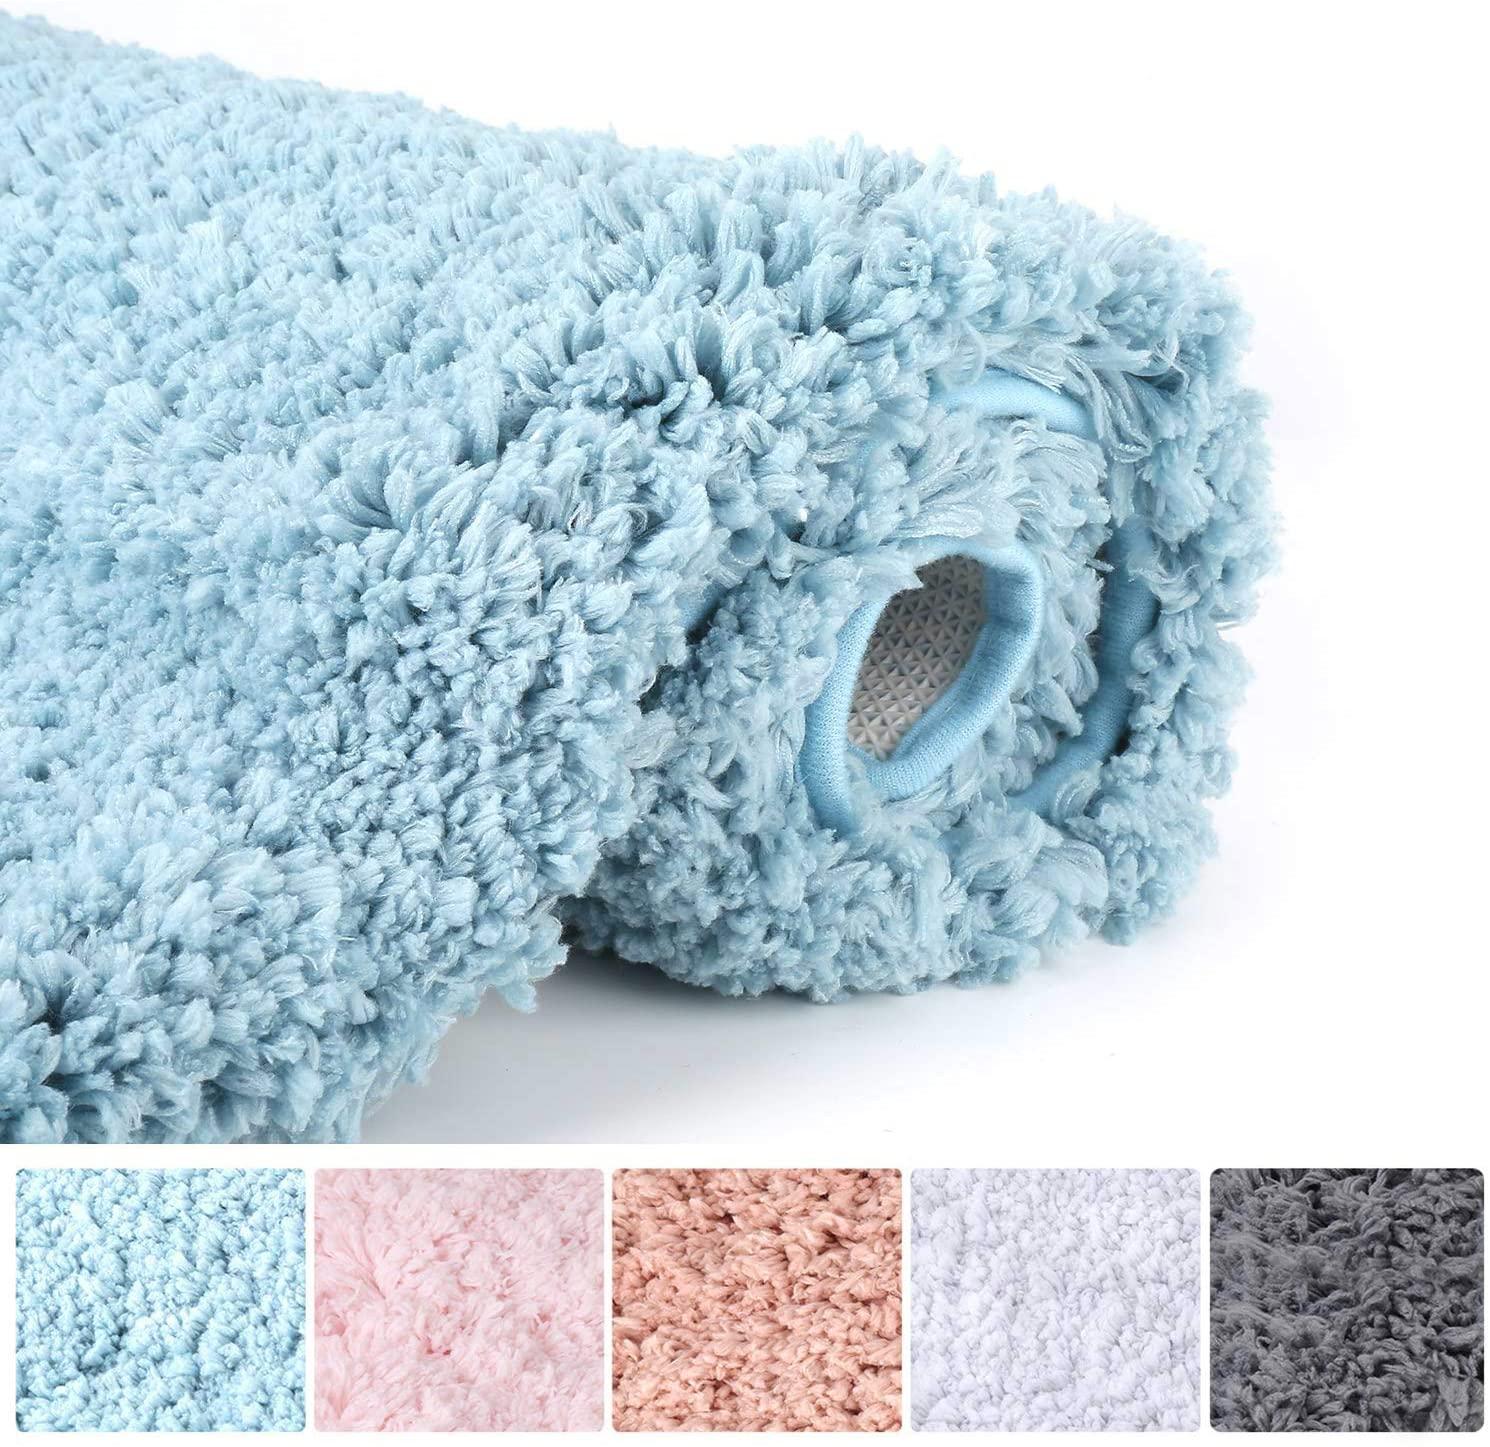 Bathroom Rugs Microfiber Plush Bath Mat Machine Washable, Slip Resistance Rubber and Absorbency Bath Rugs for Bathroom Floor, Door and Sink, Rectangular Floor Mat,Blue,32x 20